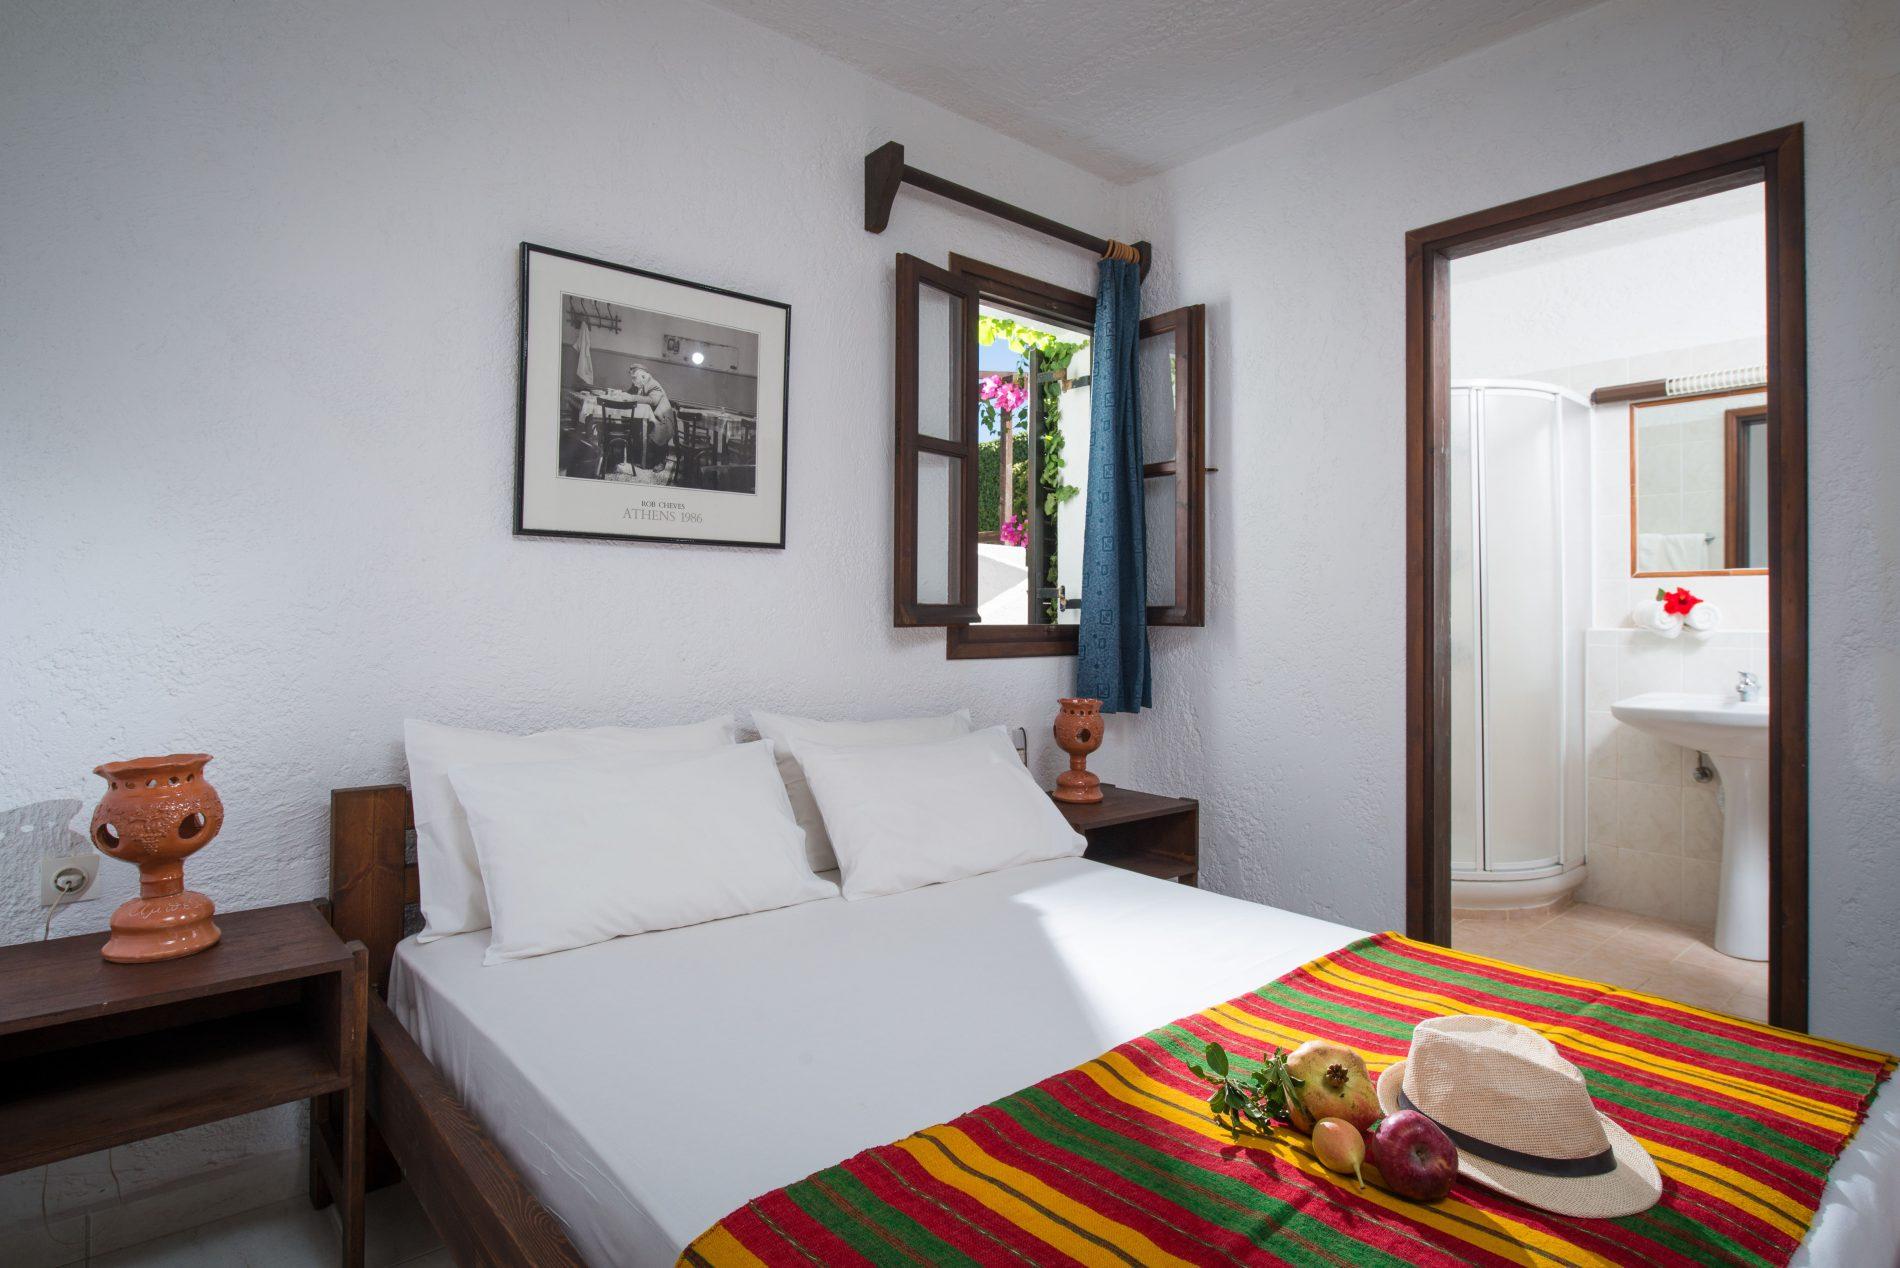 double apartments ambelos apartments agia pelagia crete greece nature peacefulness cretan hospitality